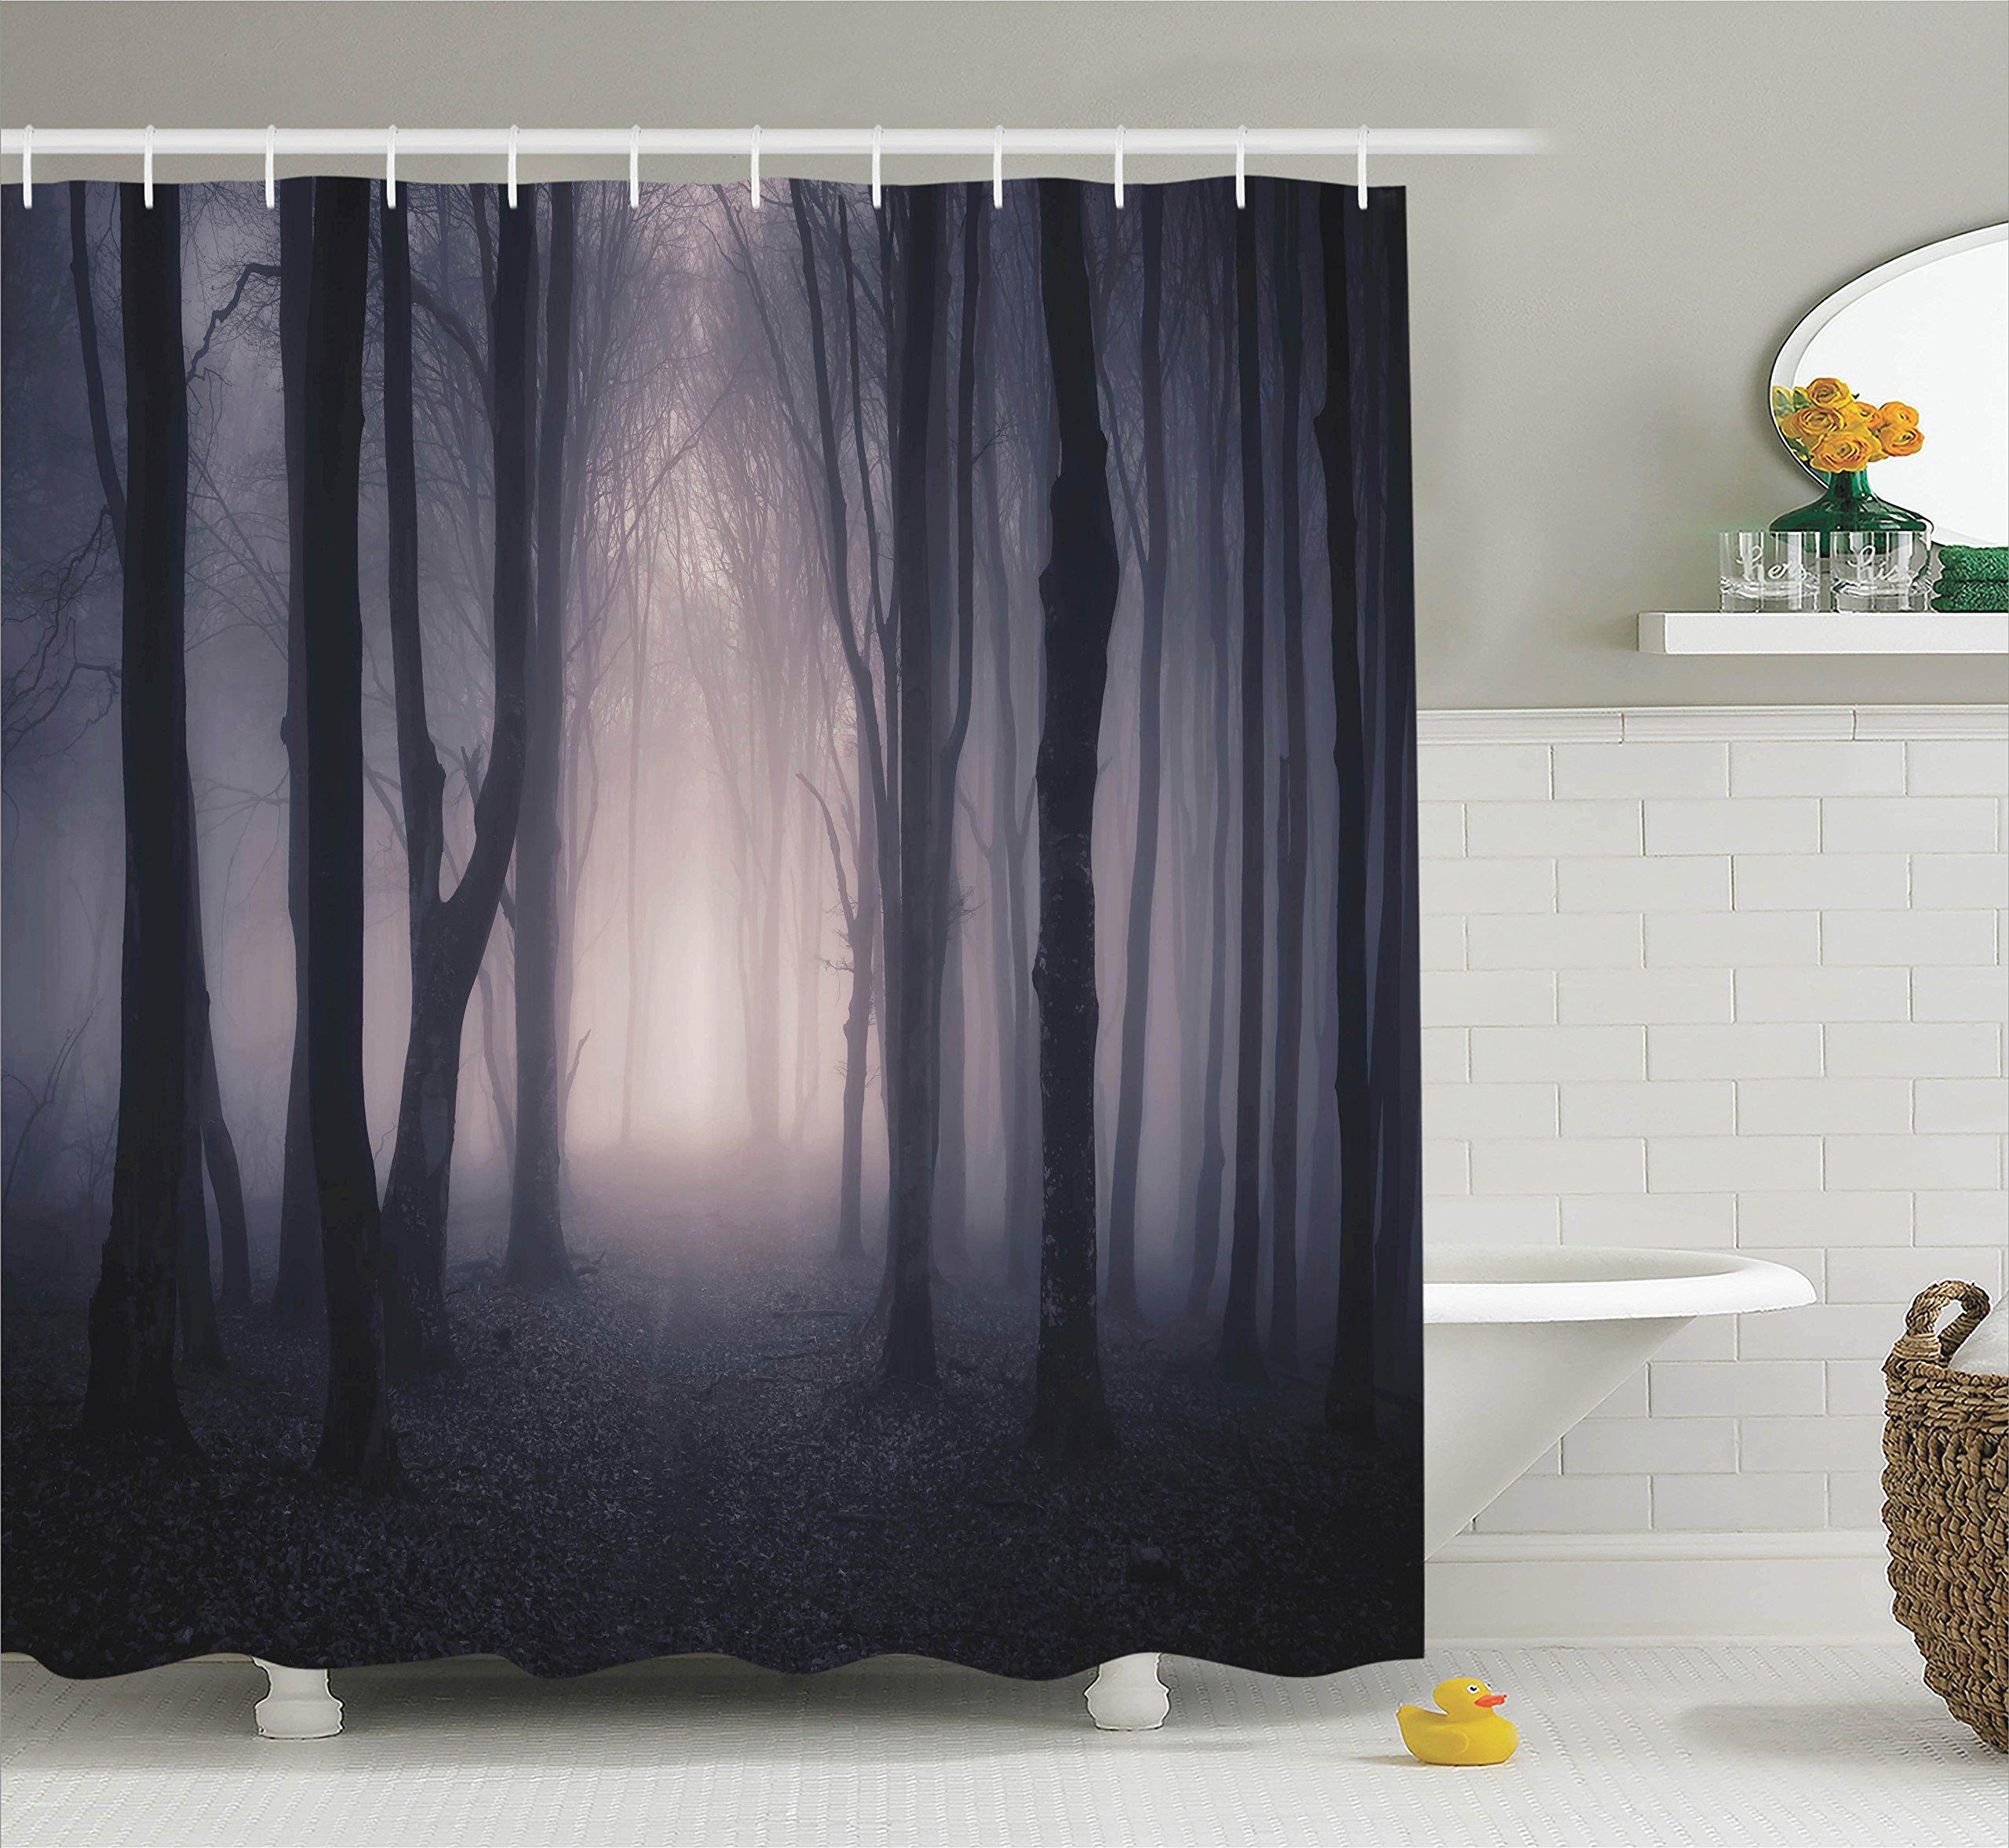 Halloween Shower Curtain Creepy Twisted Branches Farm House Decor